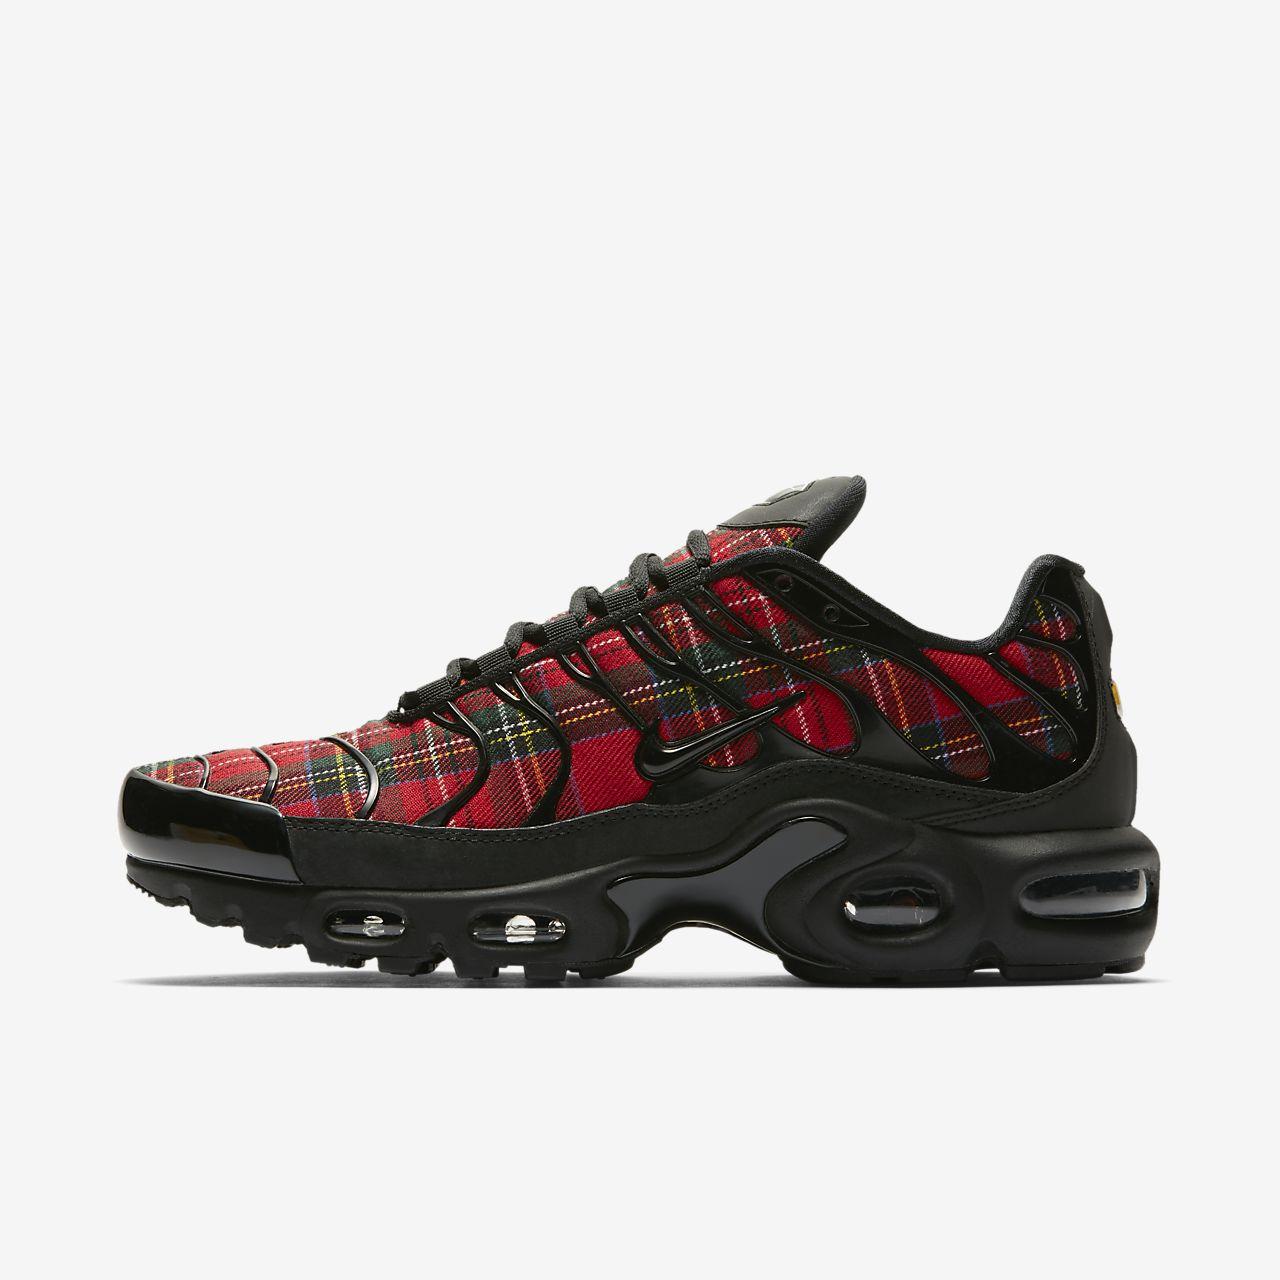 Cheap Nike Air Max 95 Essential Nike New Arrival Shoes mens womens shoes Team RedUniversity RedBlack Discount Sale 2018 black friday 2018 2017